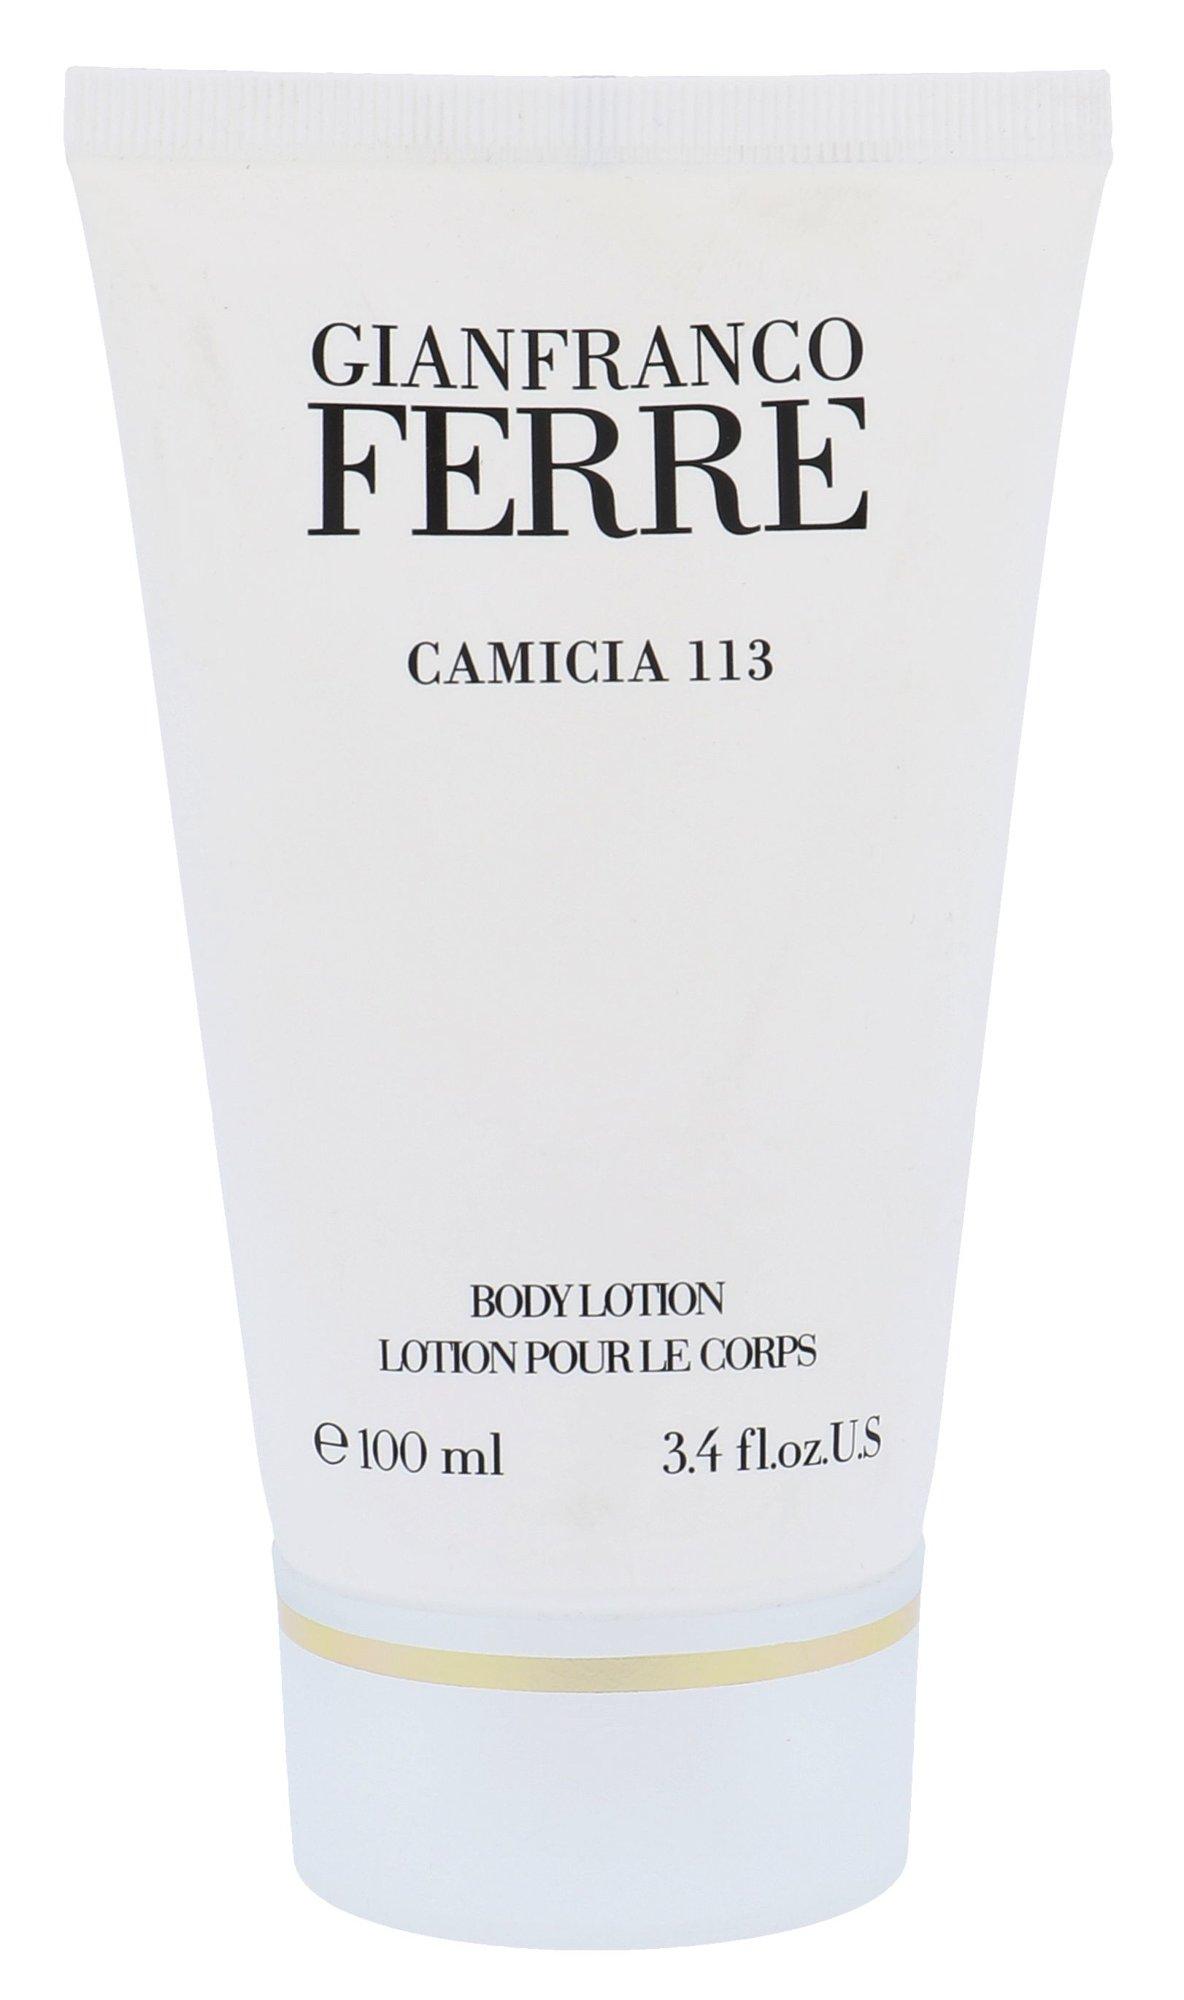 Gianfranco Ferré Camicia 113 Body lotion 100ml